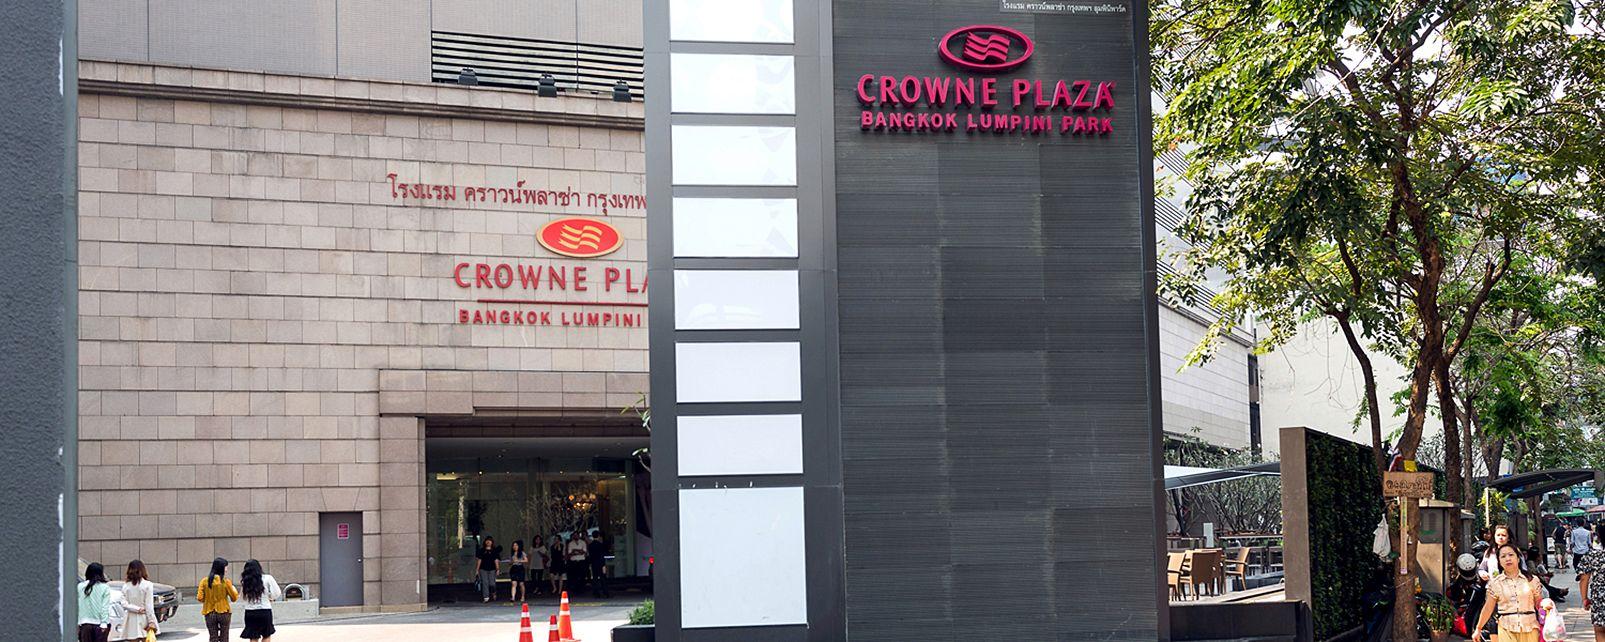 Hotel Crowne Plaza Bangkok Lumpini Park